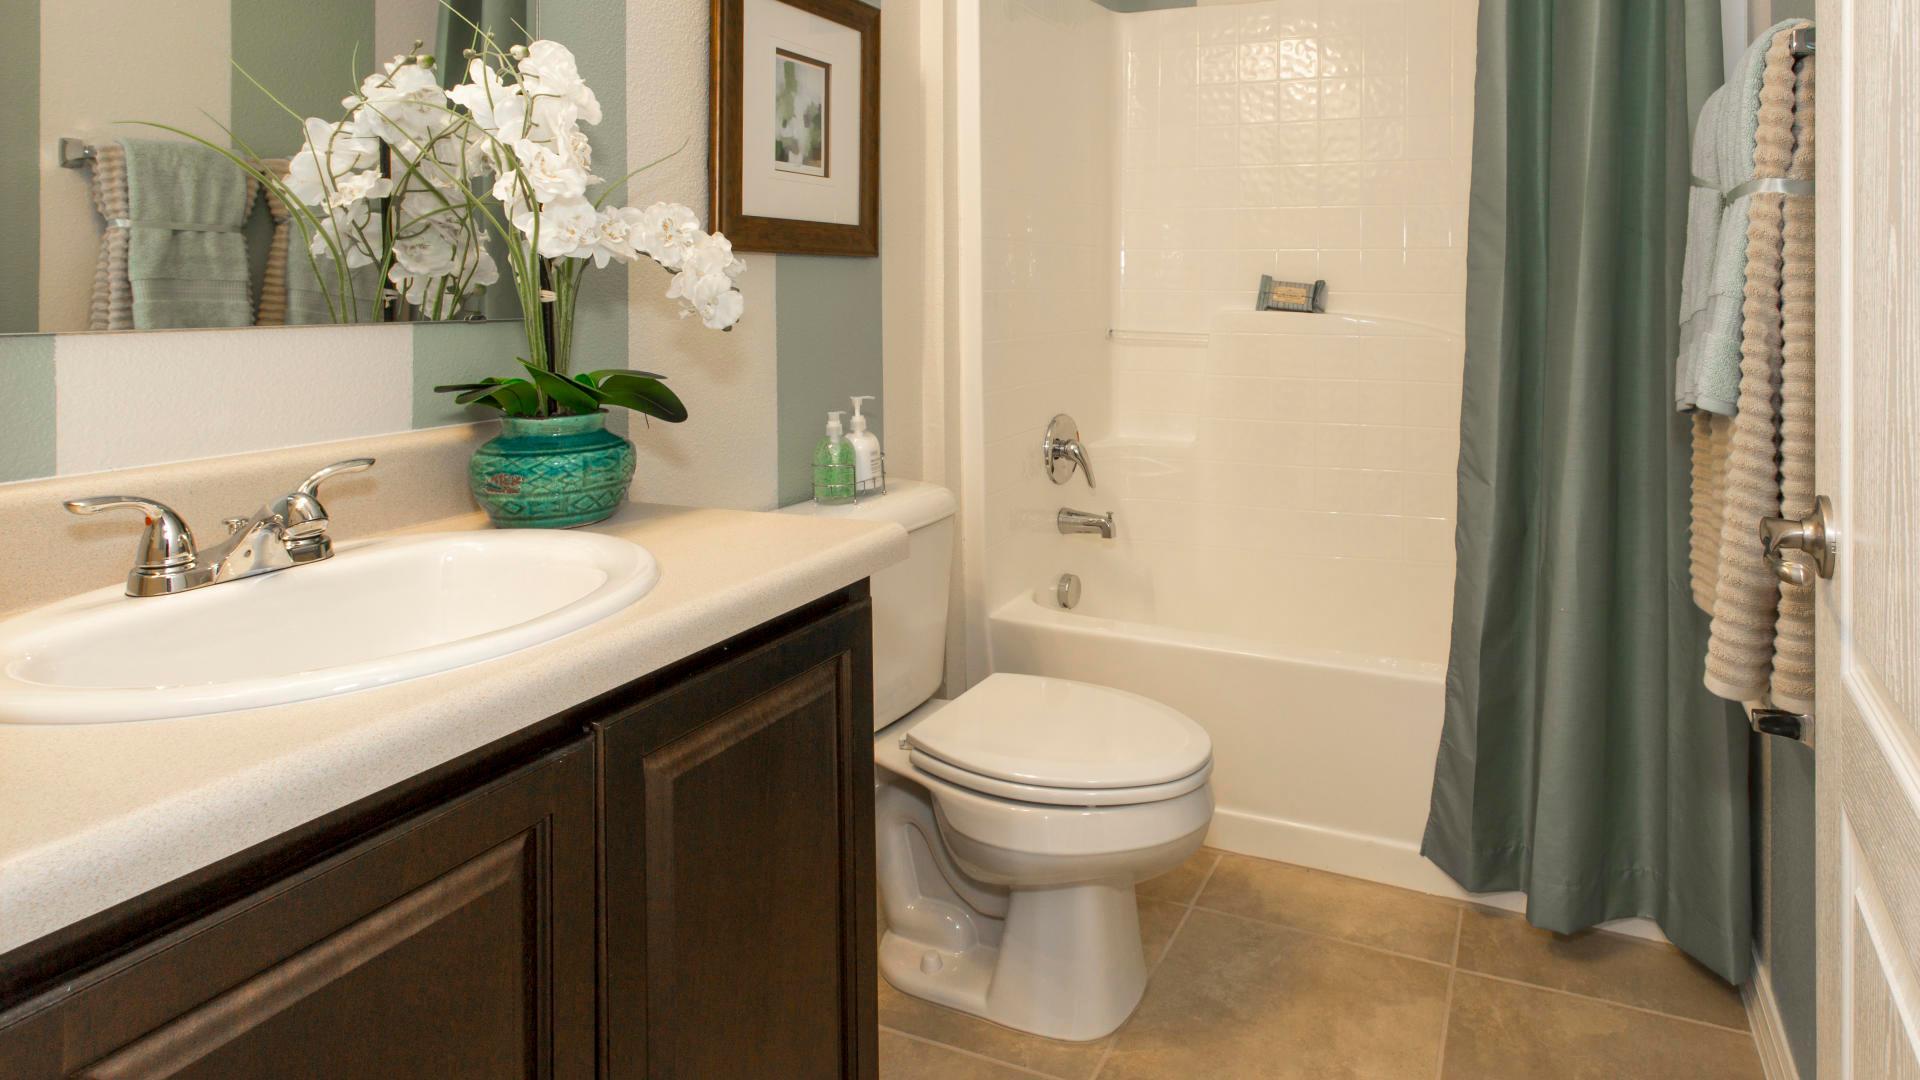 Bathroom featured in the Sierra By Maronda Homes in Naples, FL